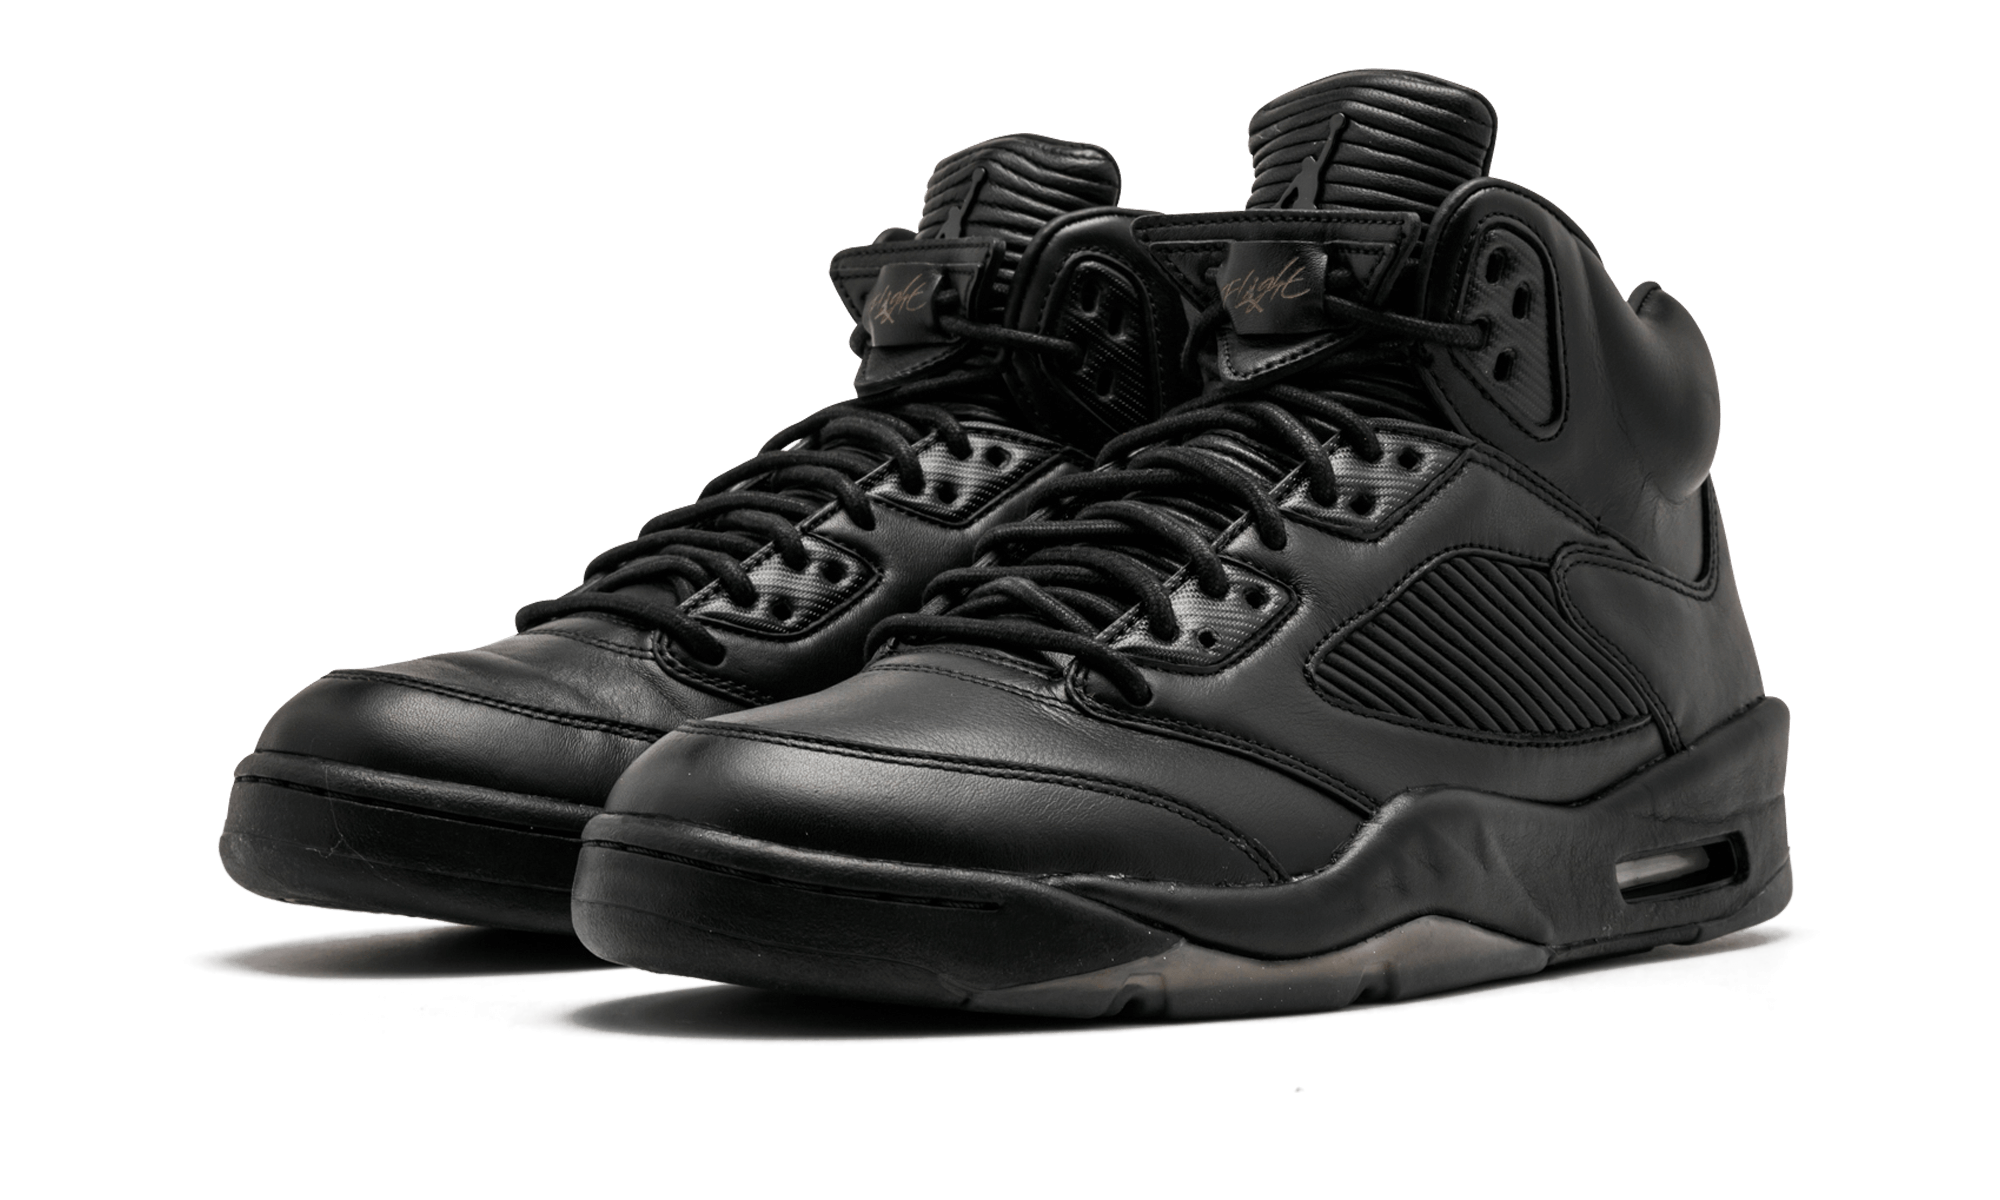 8c17188a782 Air Jordan 5 Retro Premium Black Leather Sneakers | style | Black ...